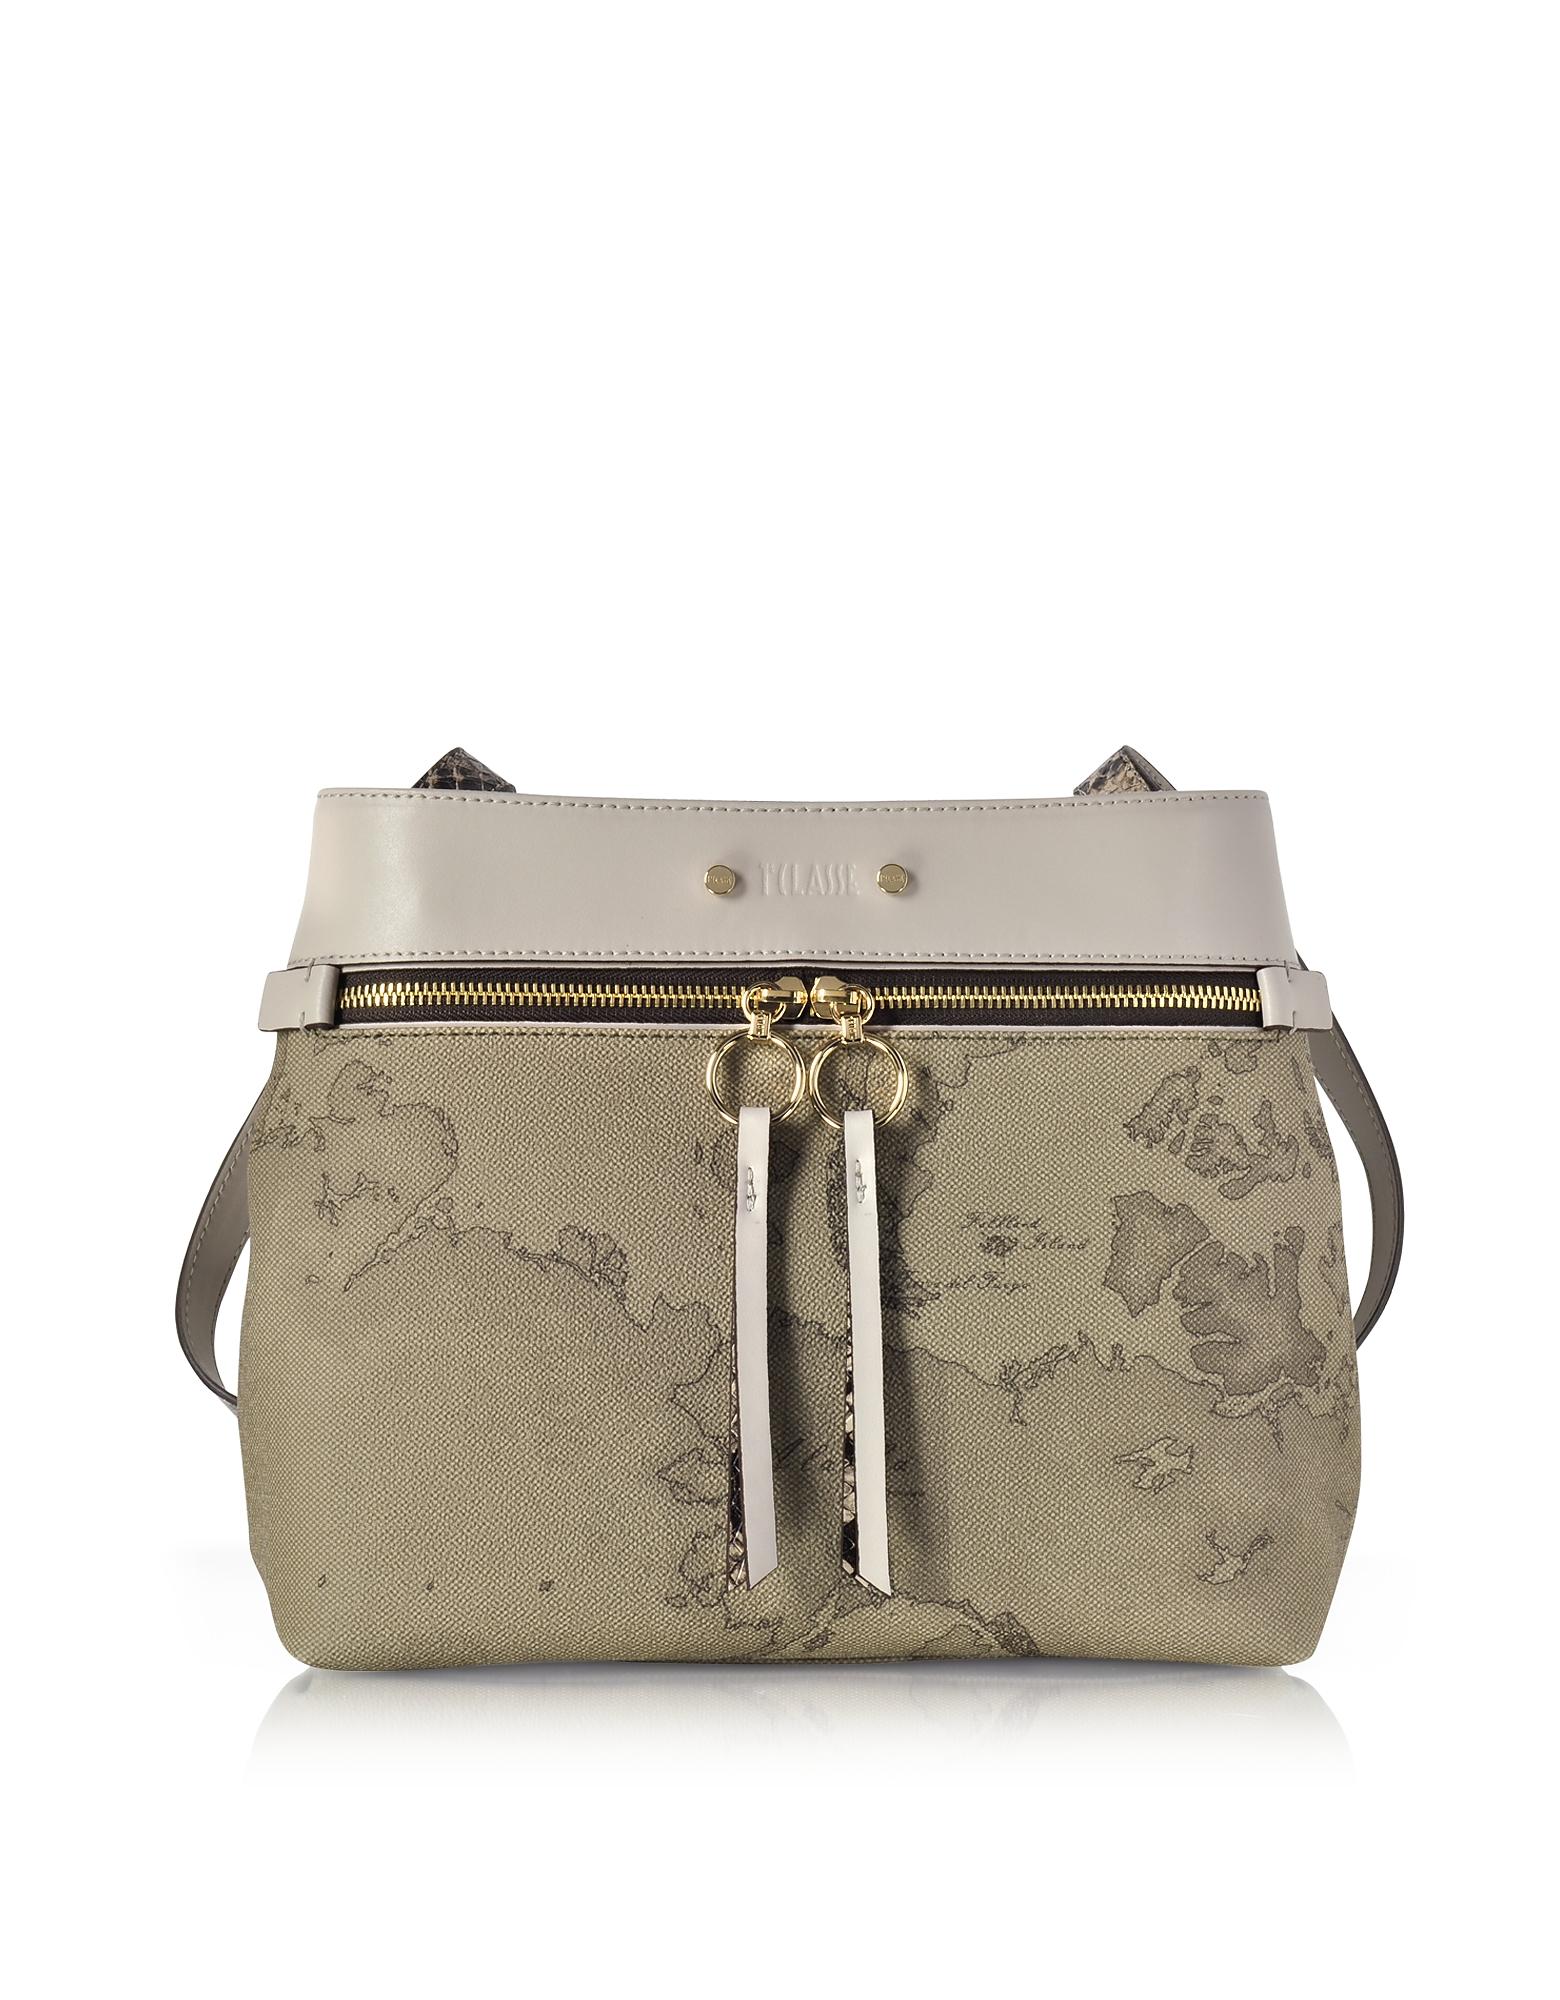 Alviero Martini 1A Classe Designer Handbags, Vanity Grey Leather Shoulder Bag av130417-022-00